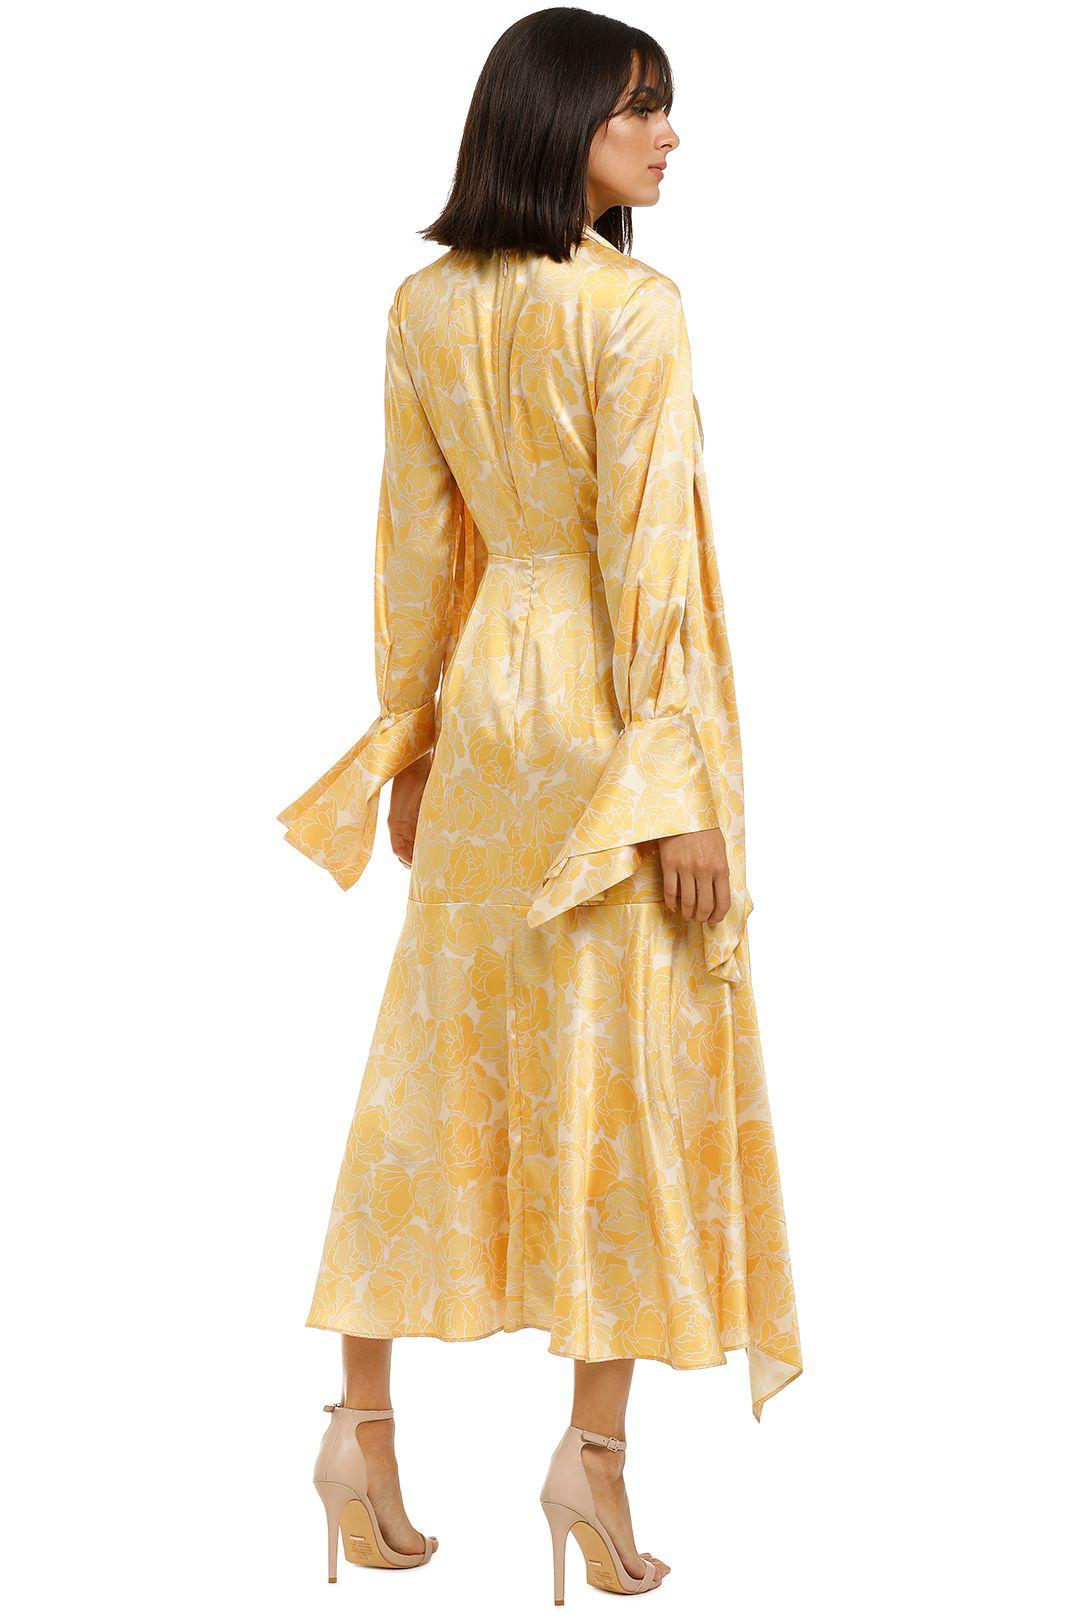 Acler-Wallace-Dress-Lemon-Floral-Back